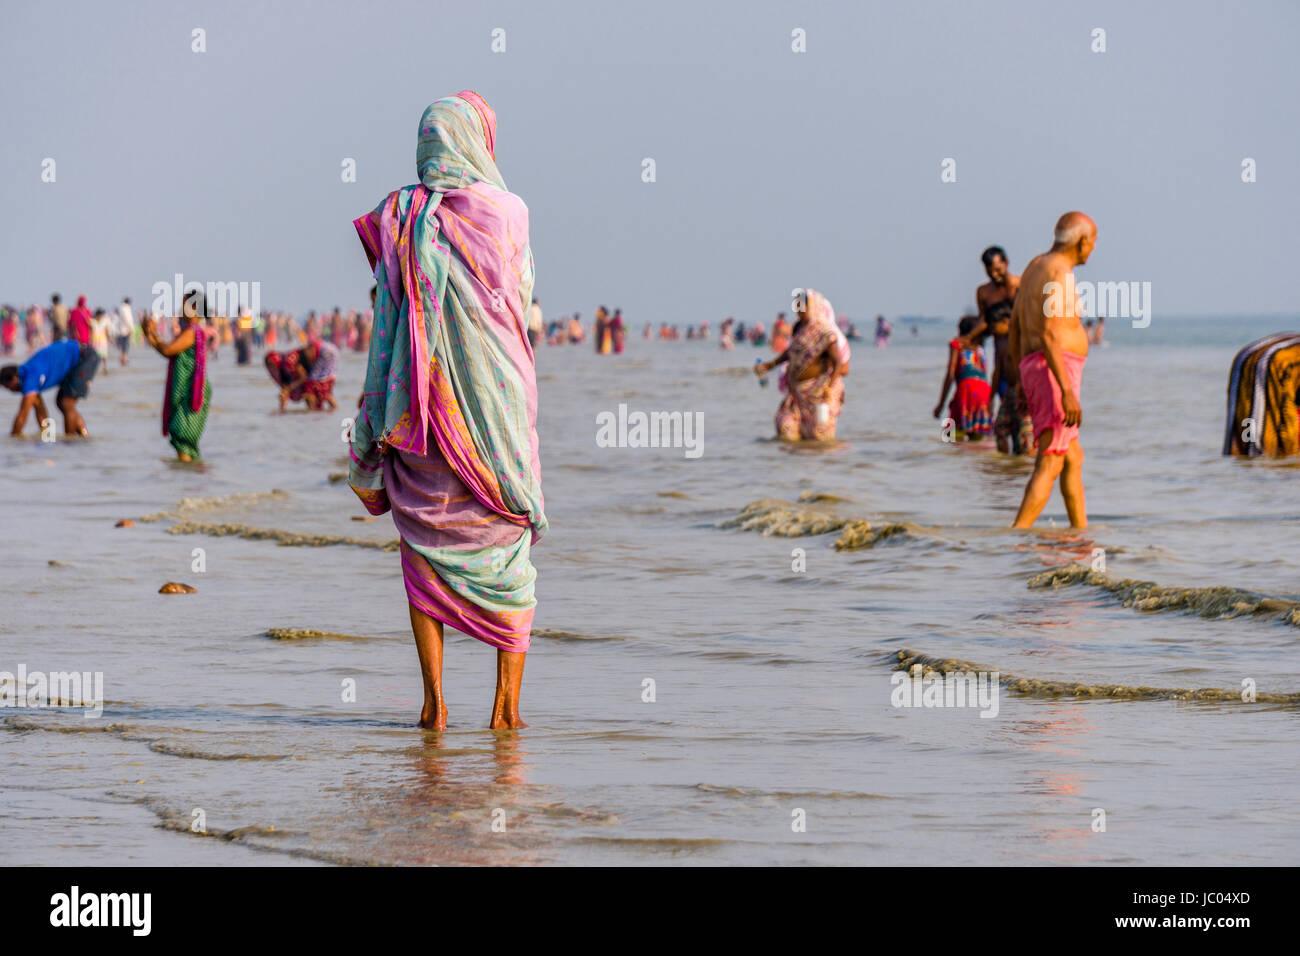 Hundreds of pilgrims are gathering on the beach of Ganga Sagar, celebrating Maghi Purnima festival Stock Photo